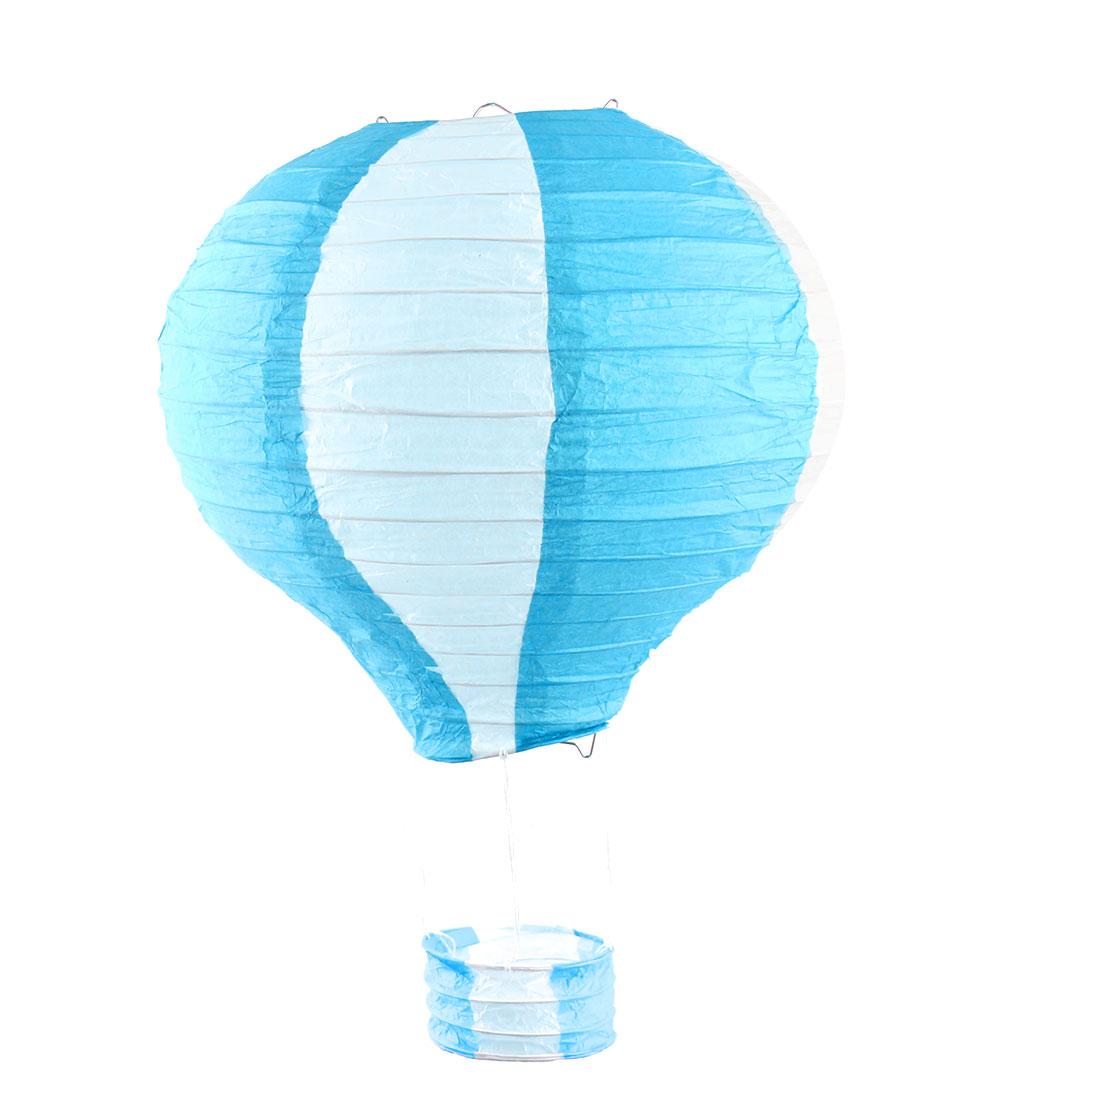 Engagement Festival Party Paper DIY Handmade Lightless Hanging Hot Air Balloon Lantern Sky Blue White